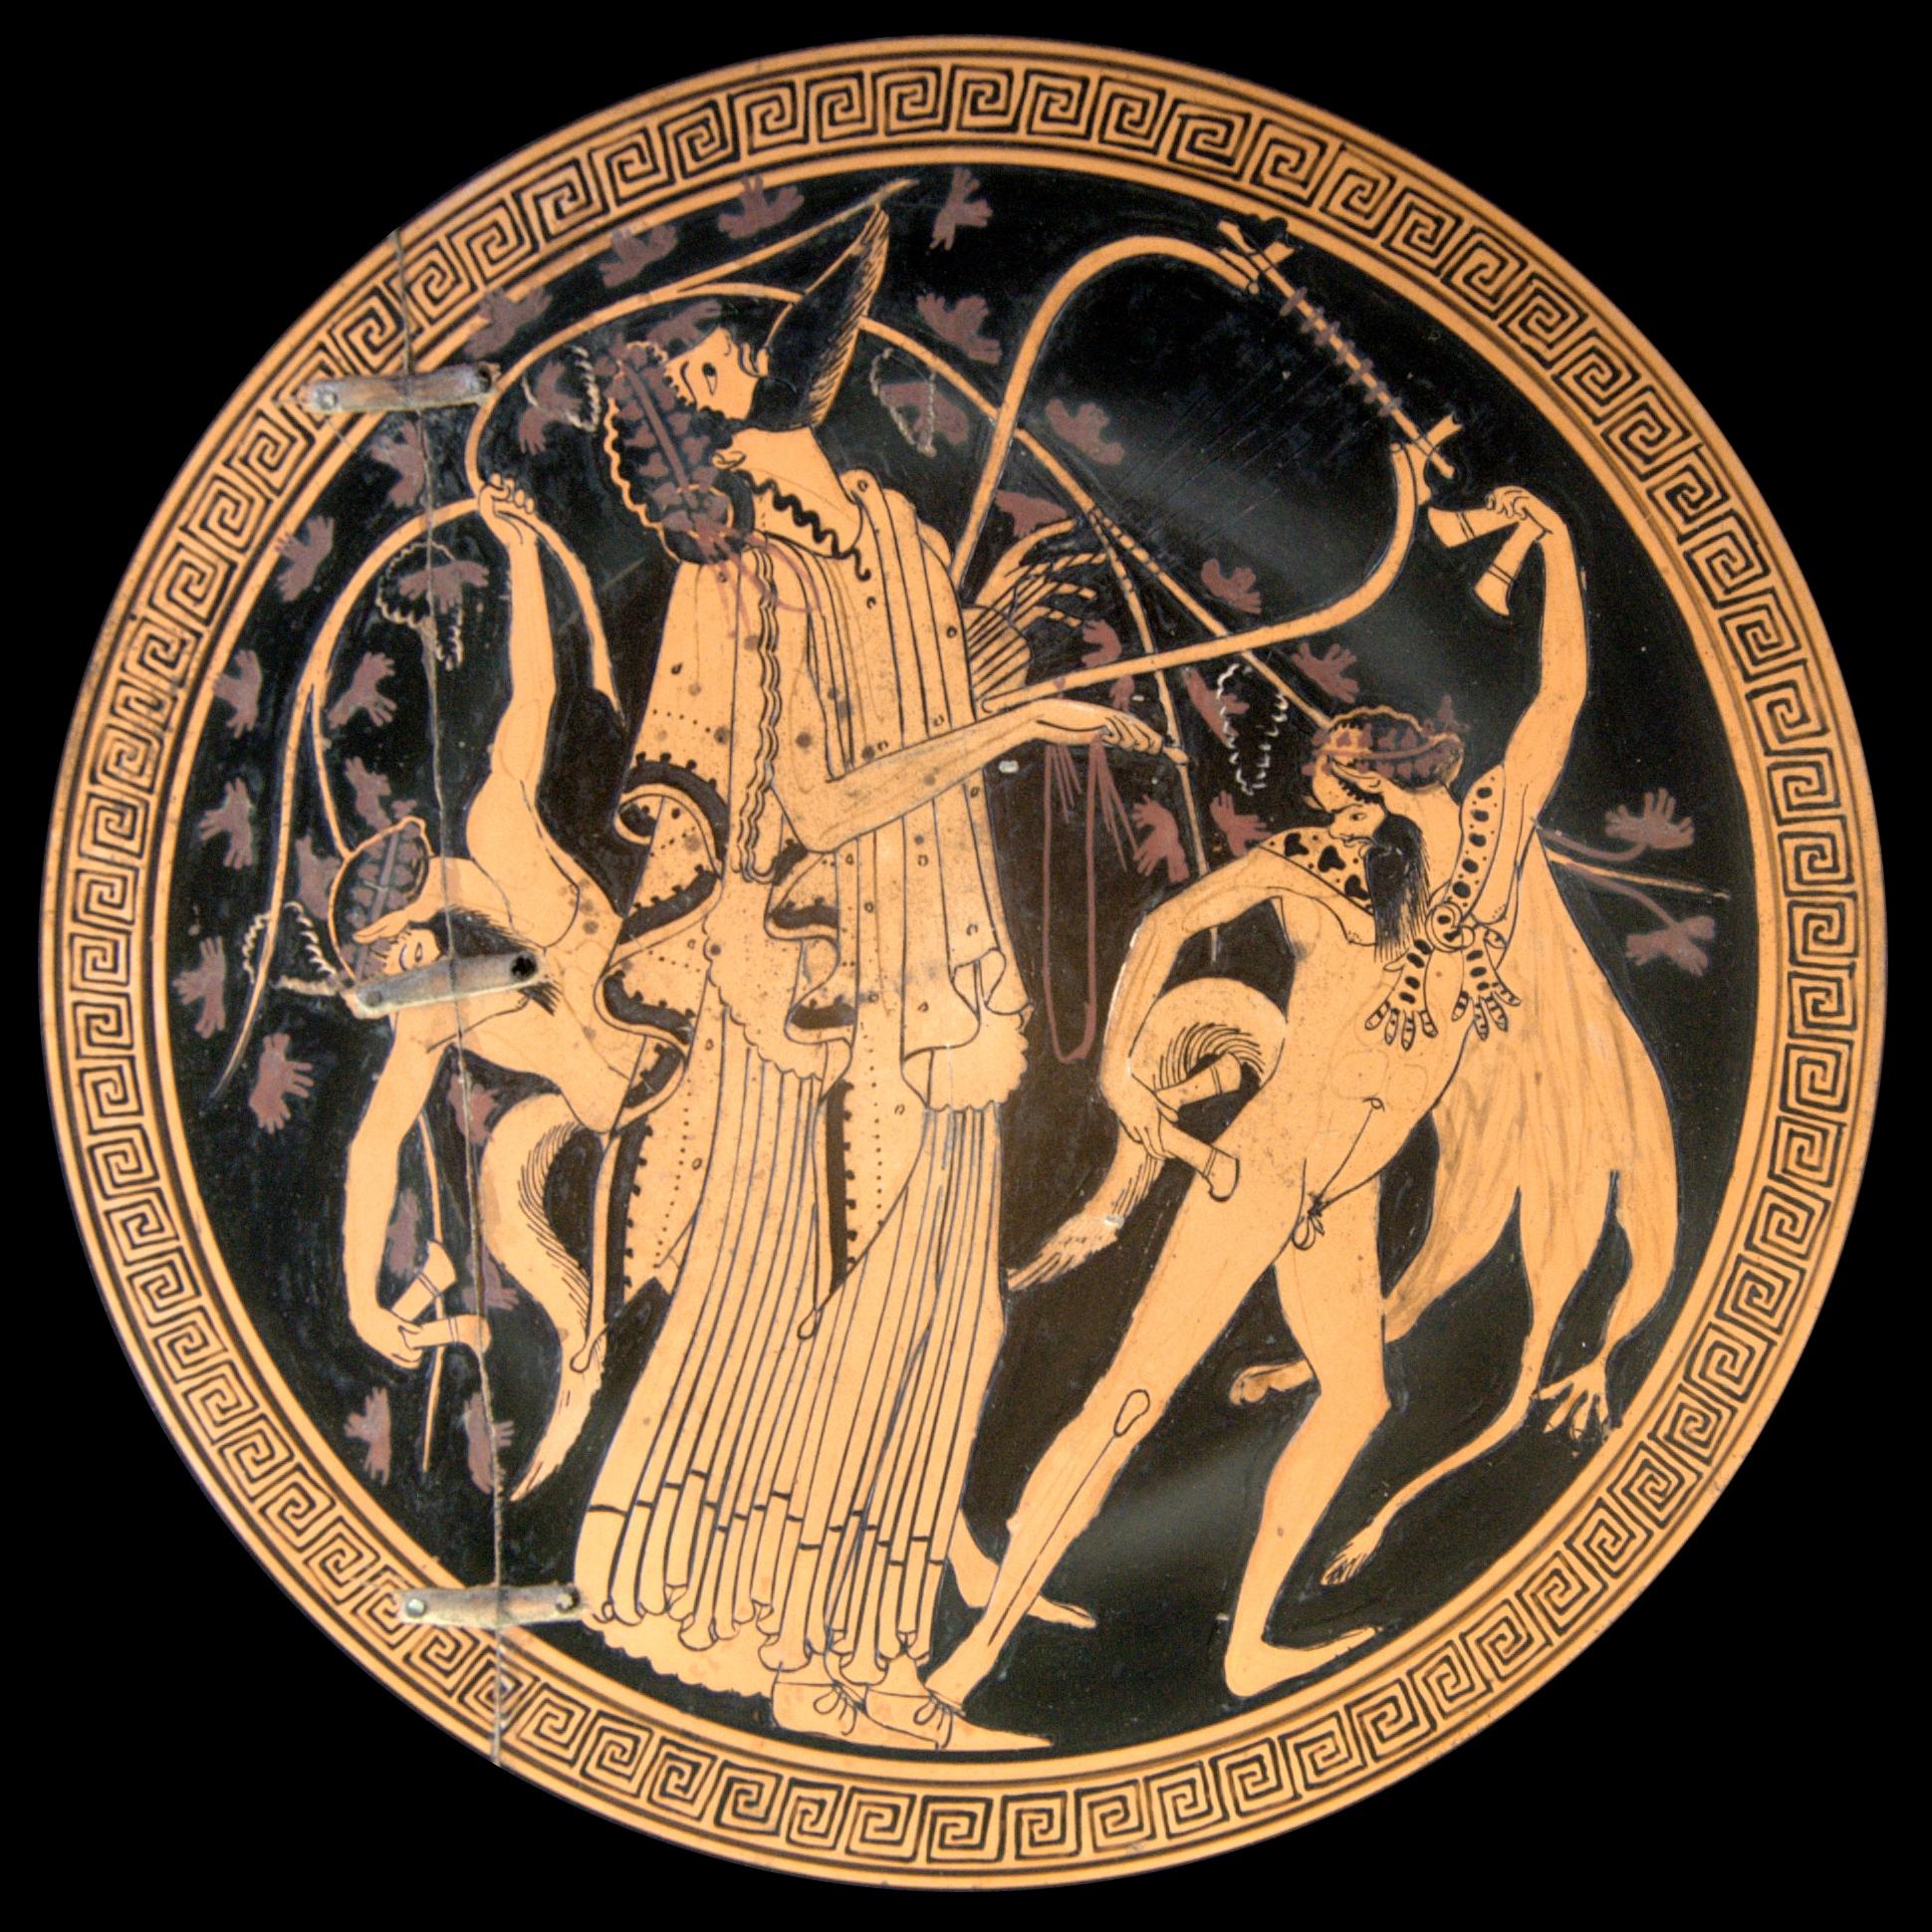 2012-12-20-Dionysos_satyrs_Cdm_Paris_575.jpg